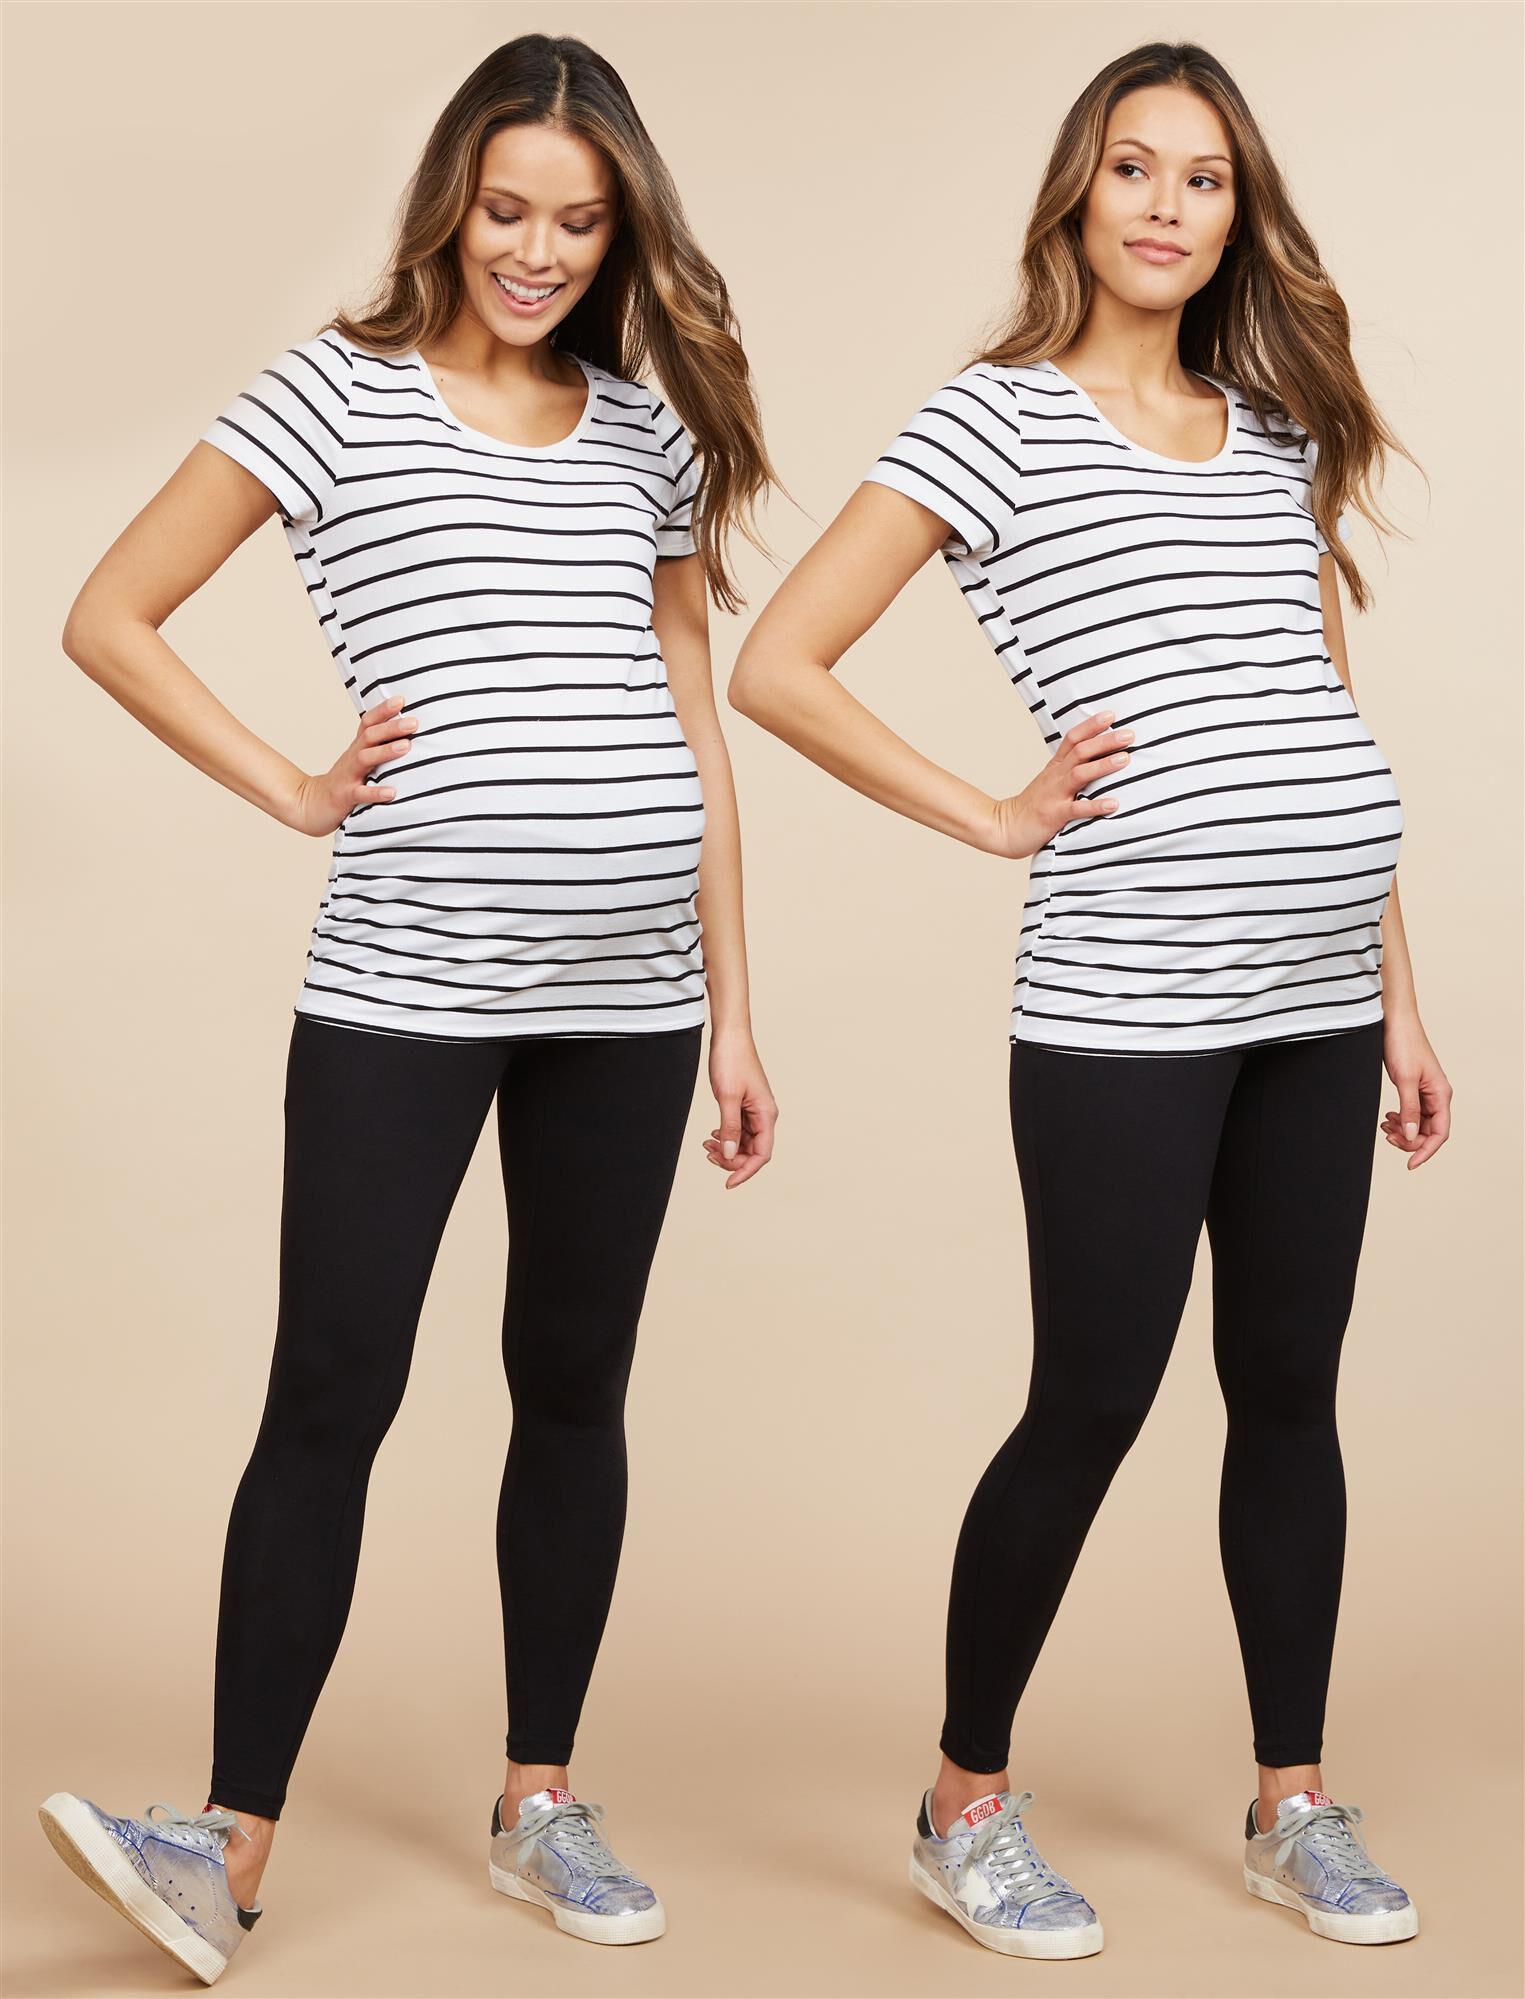 BumpStart Under Belly Maternity Leggings (2 Pack)- Solids